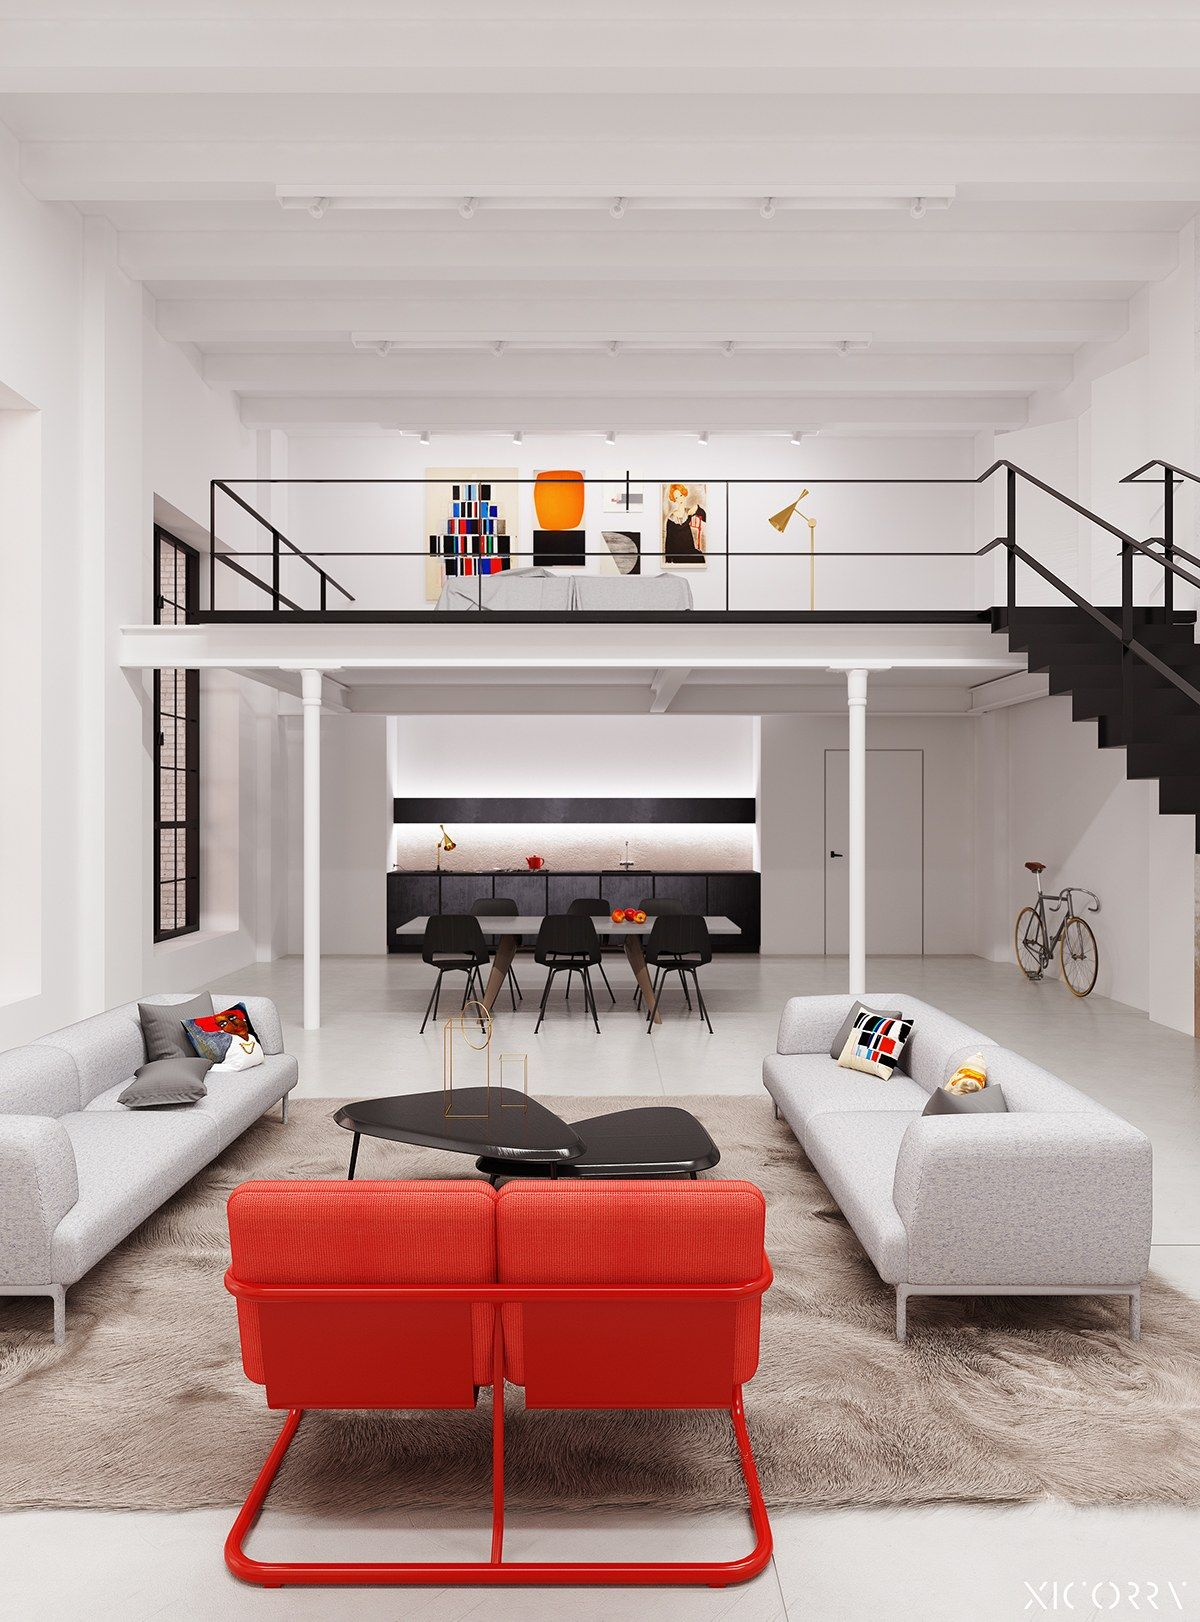 4 Duplex Lofts With Massive Windows | Loft interiors ...